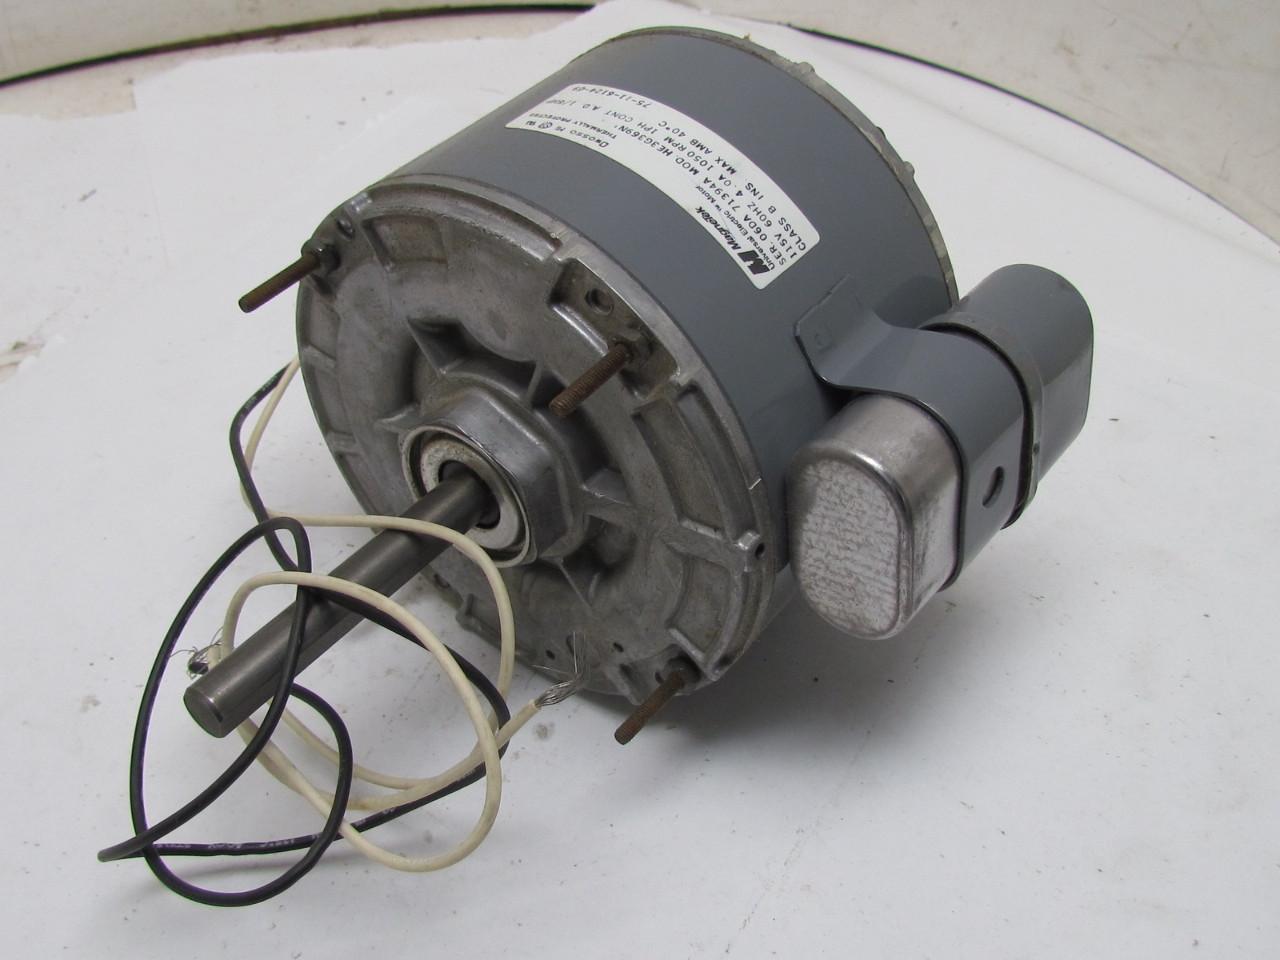 Magnetek Universal Electric Blower Motor